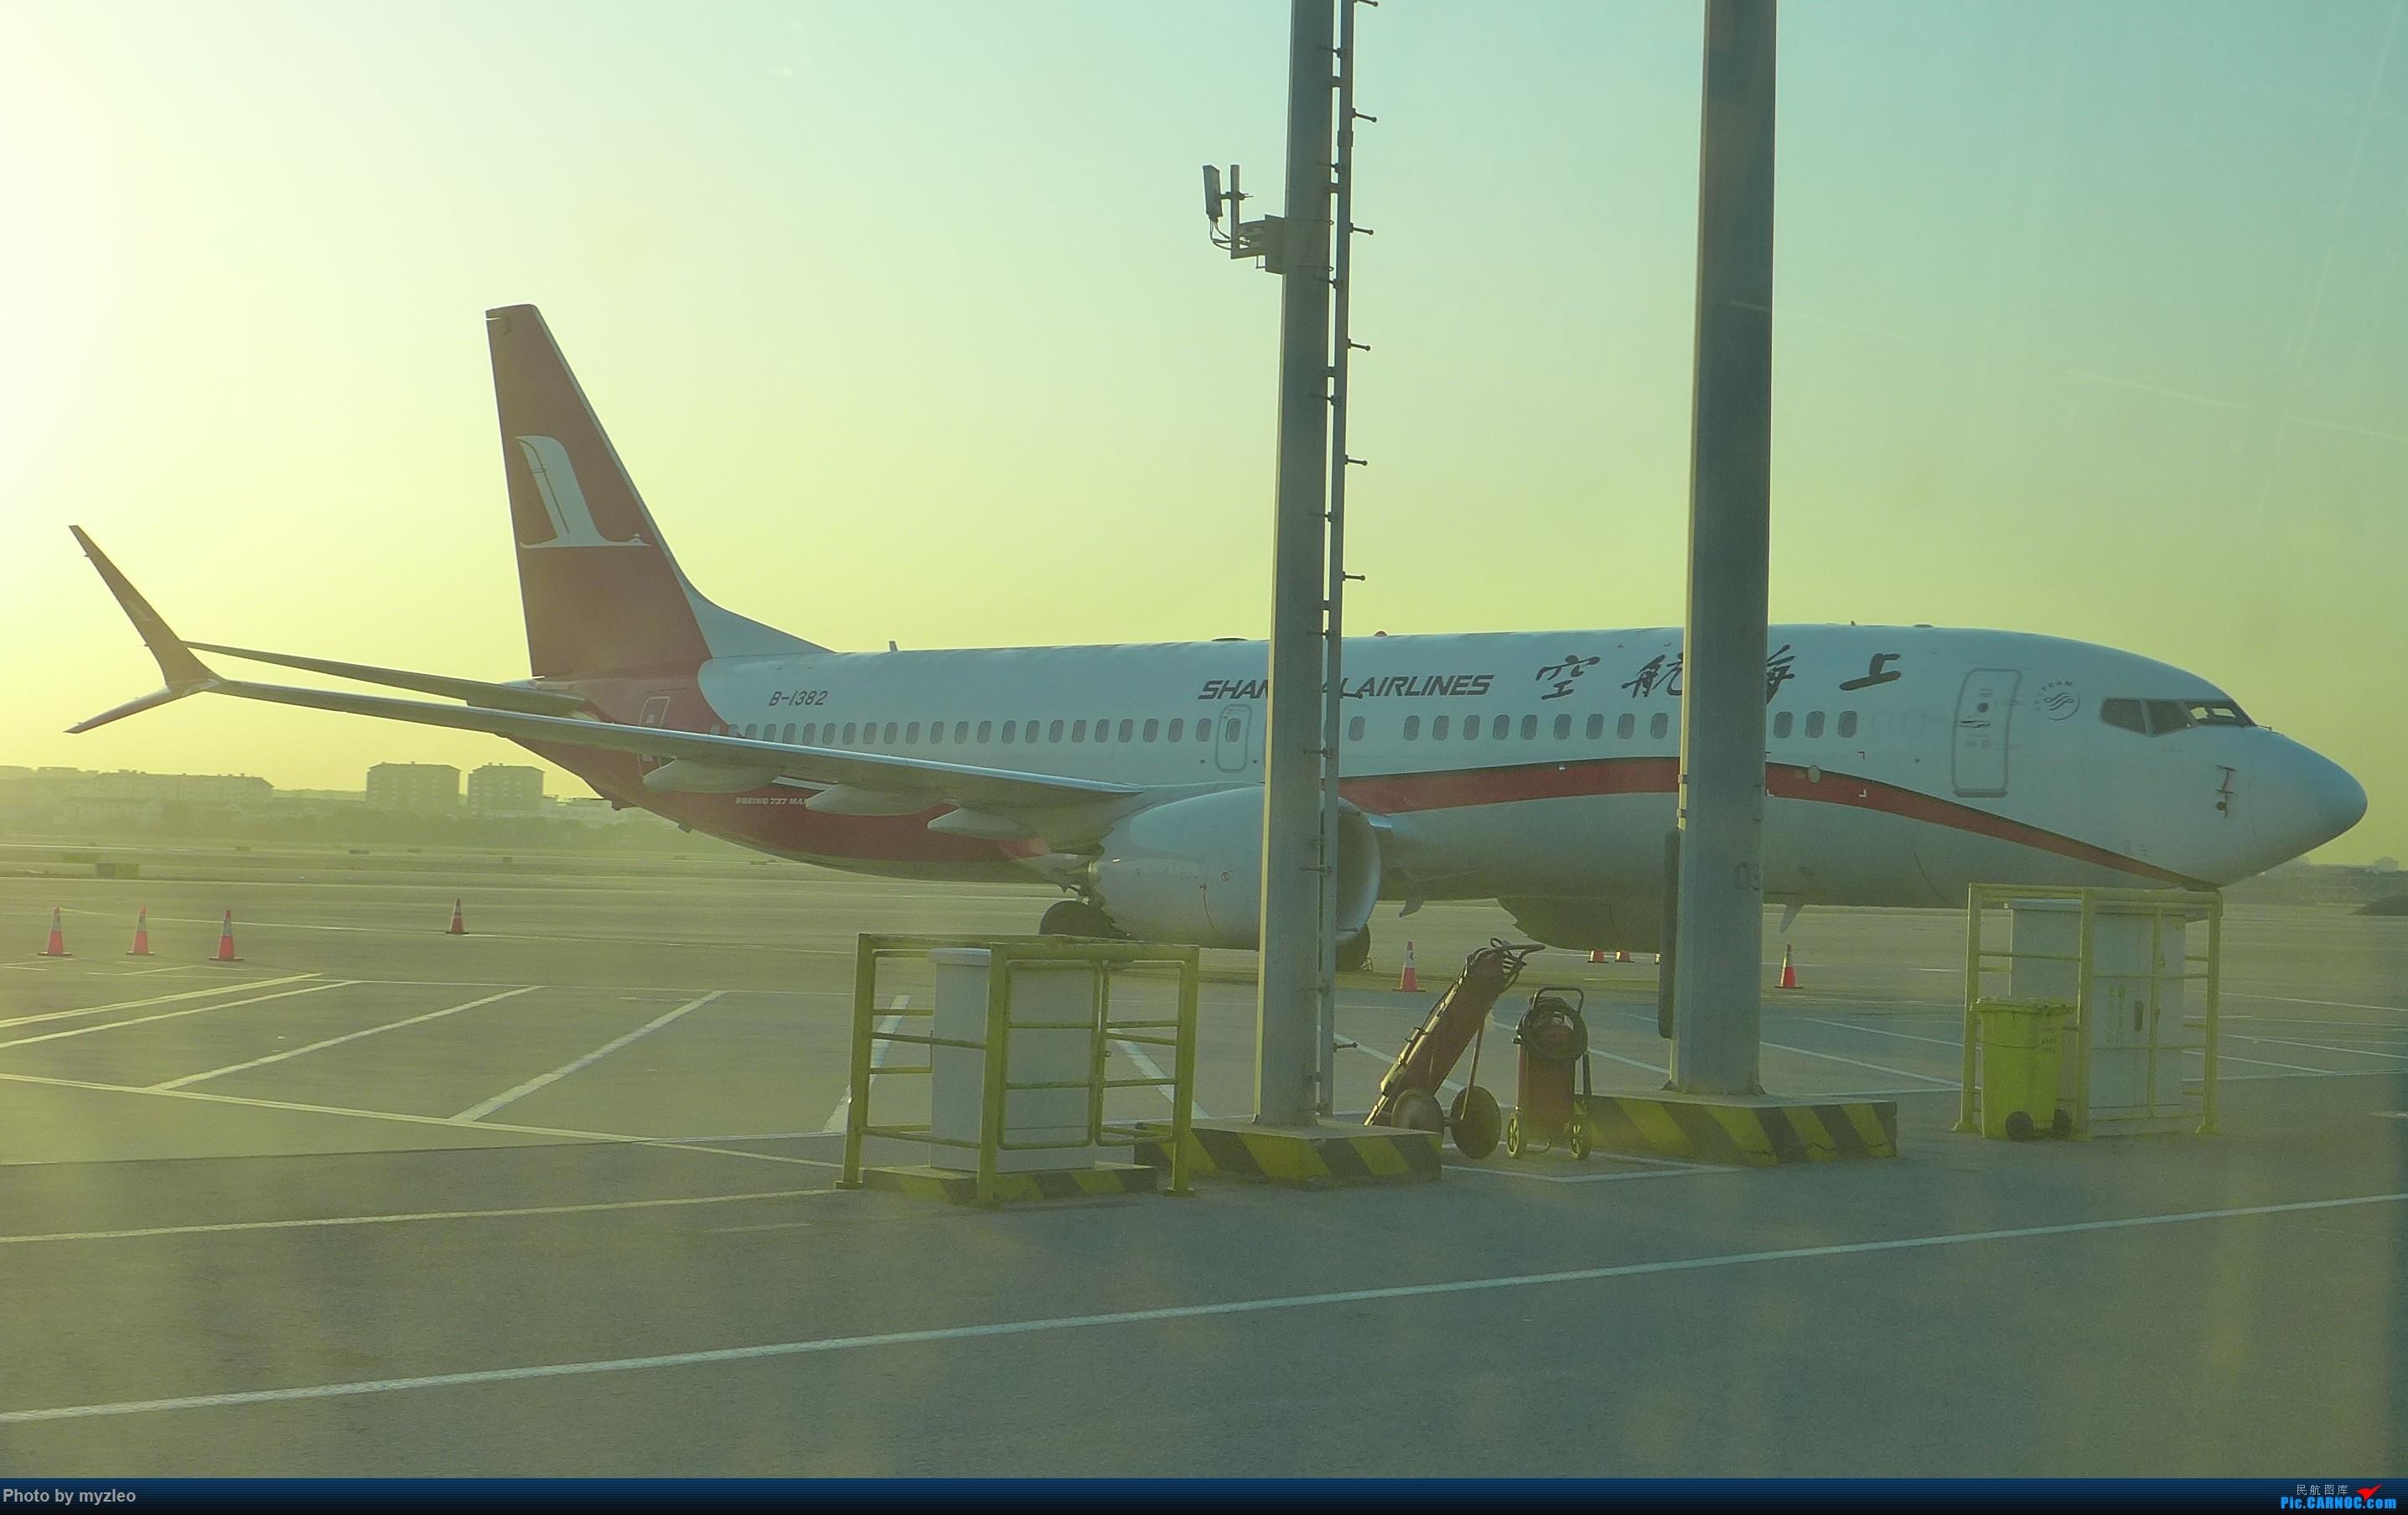 Re:[原创]【myzleo的游记1】六天五晚广州行——SHA-CAN上航商务舱初体验+广州城内 BOEING 737MAX-8 B-1382 中国上海虹桥国际机场